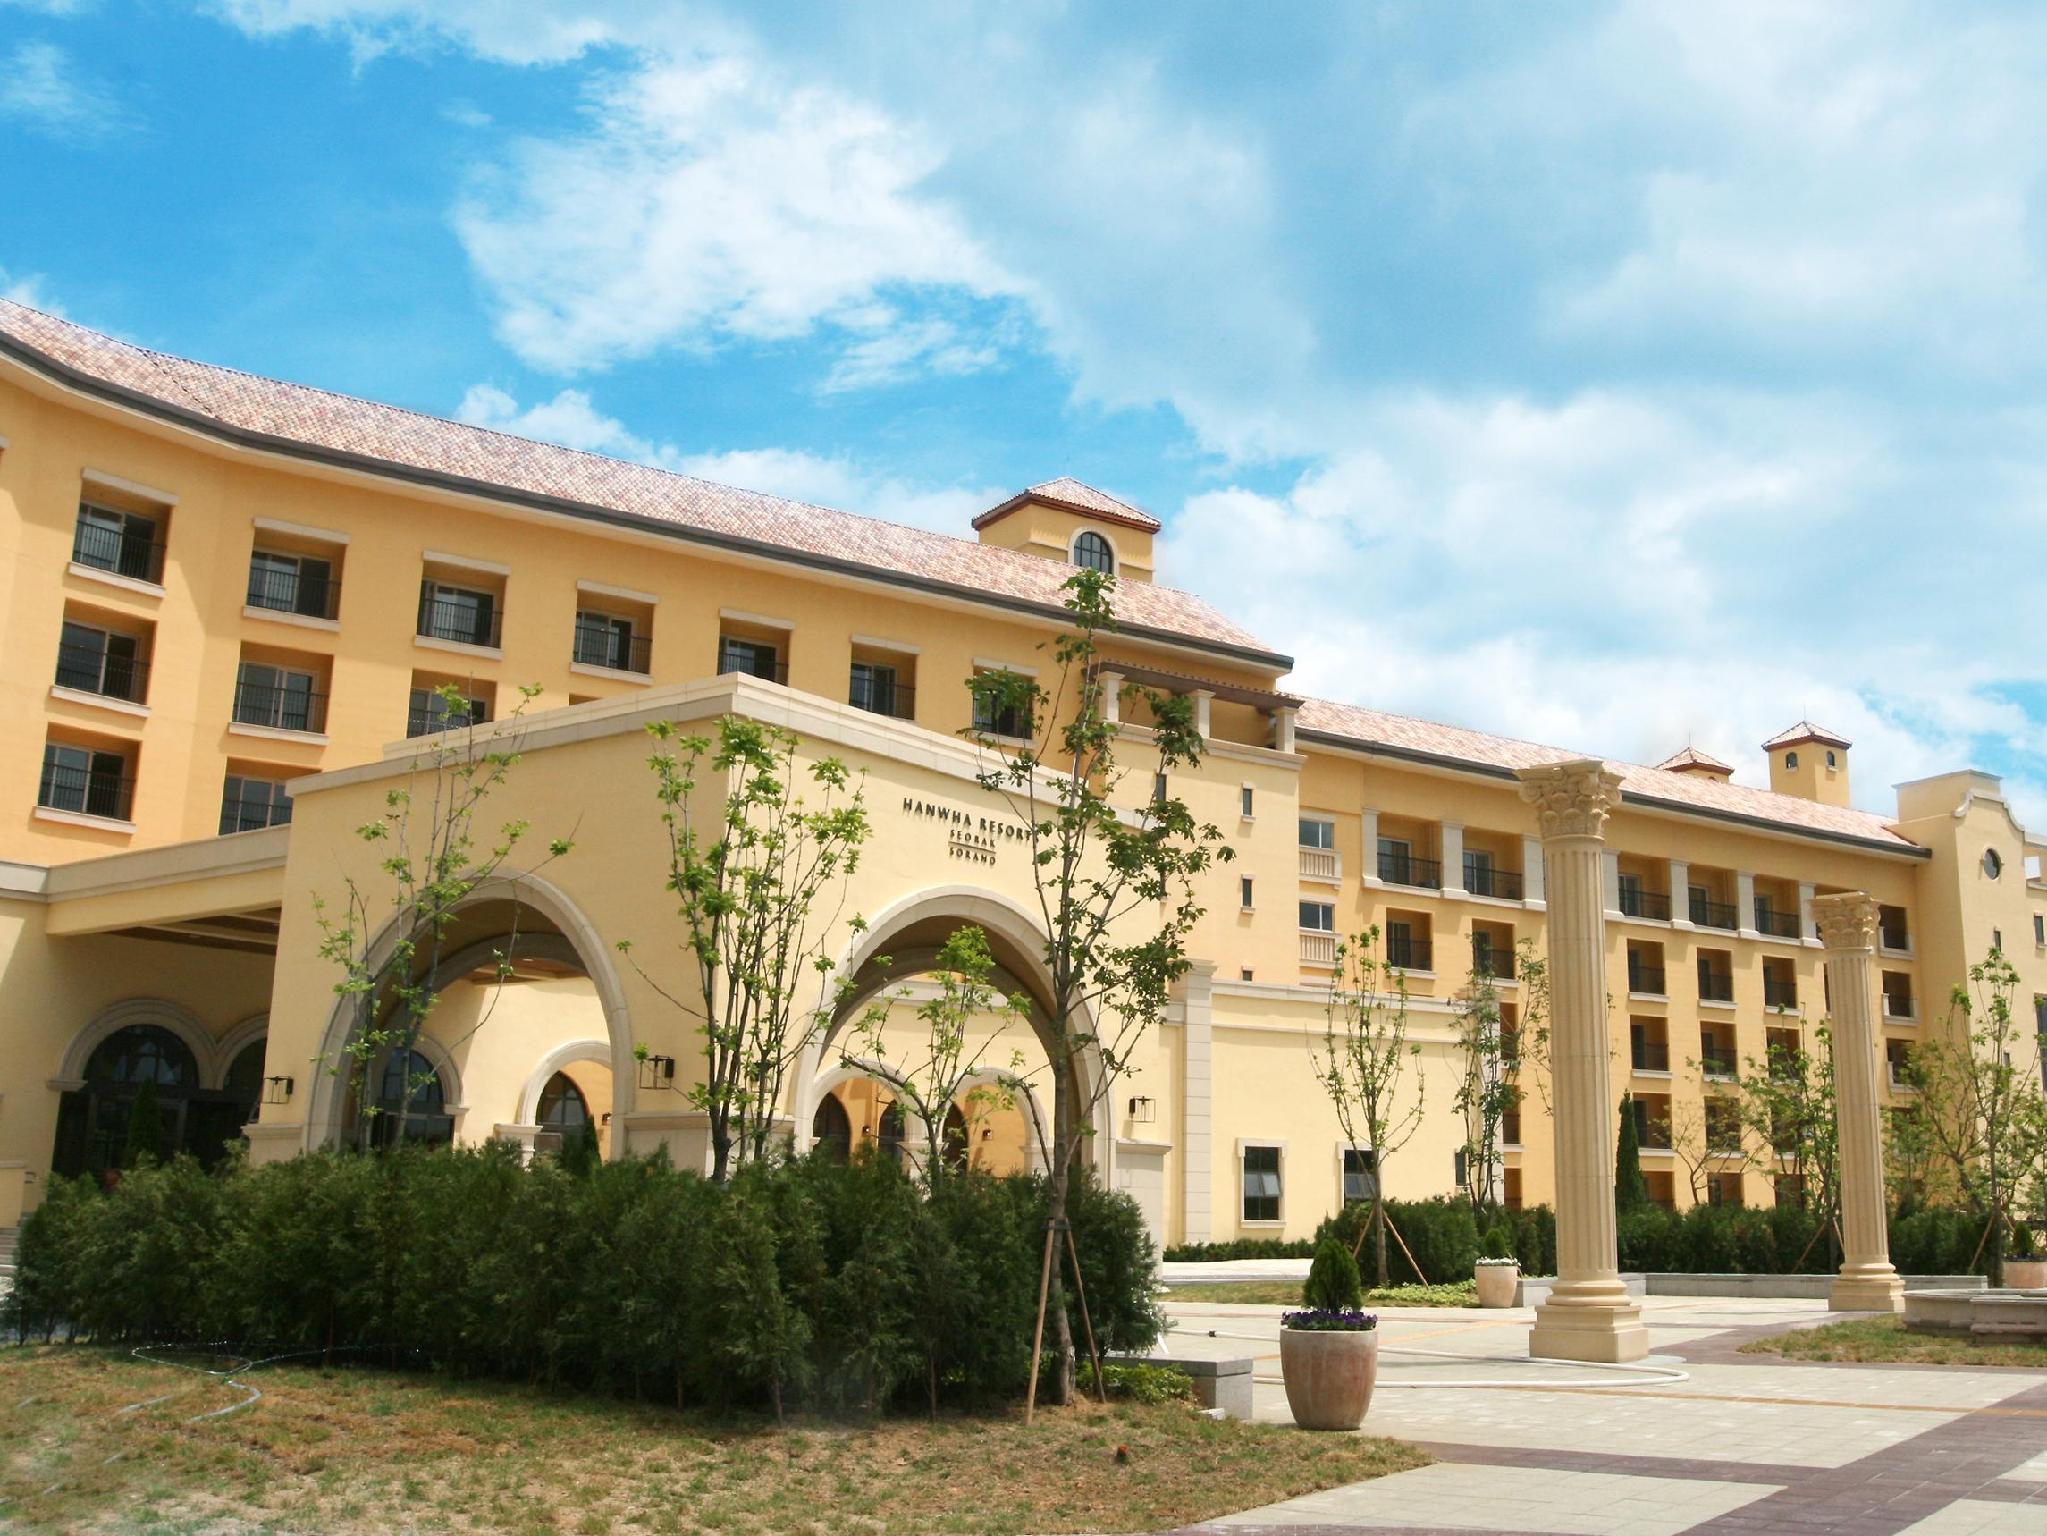 Hanwha Resort Seorak Sorano - Hotels and Accommodation in South Korea, Asia